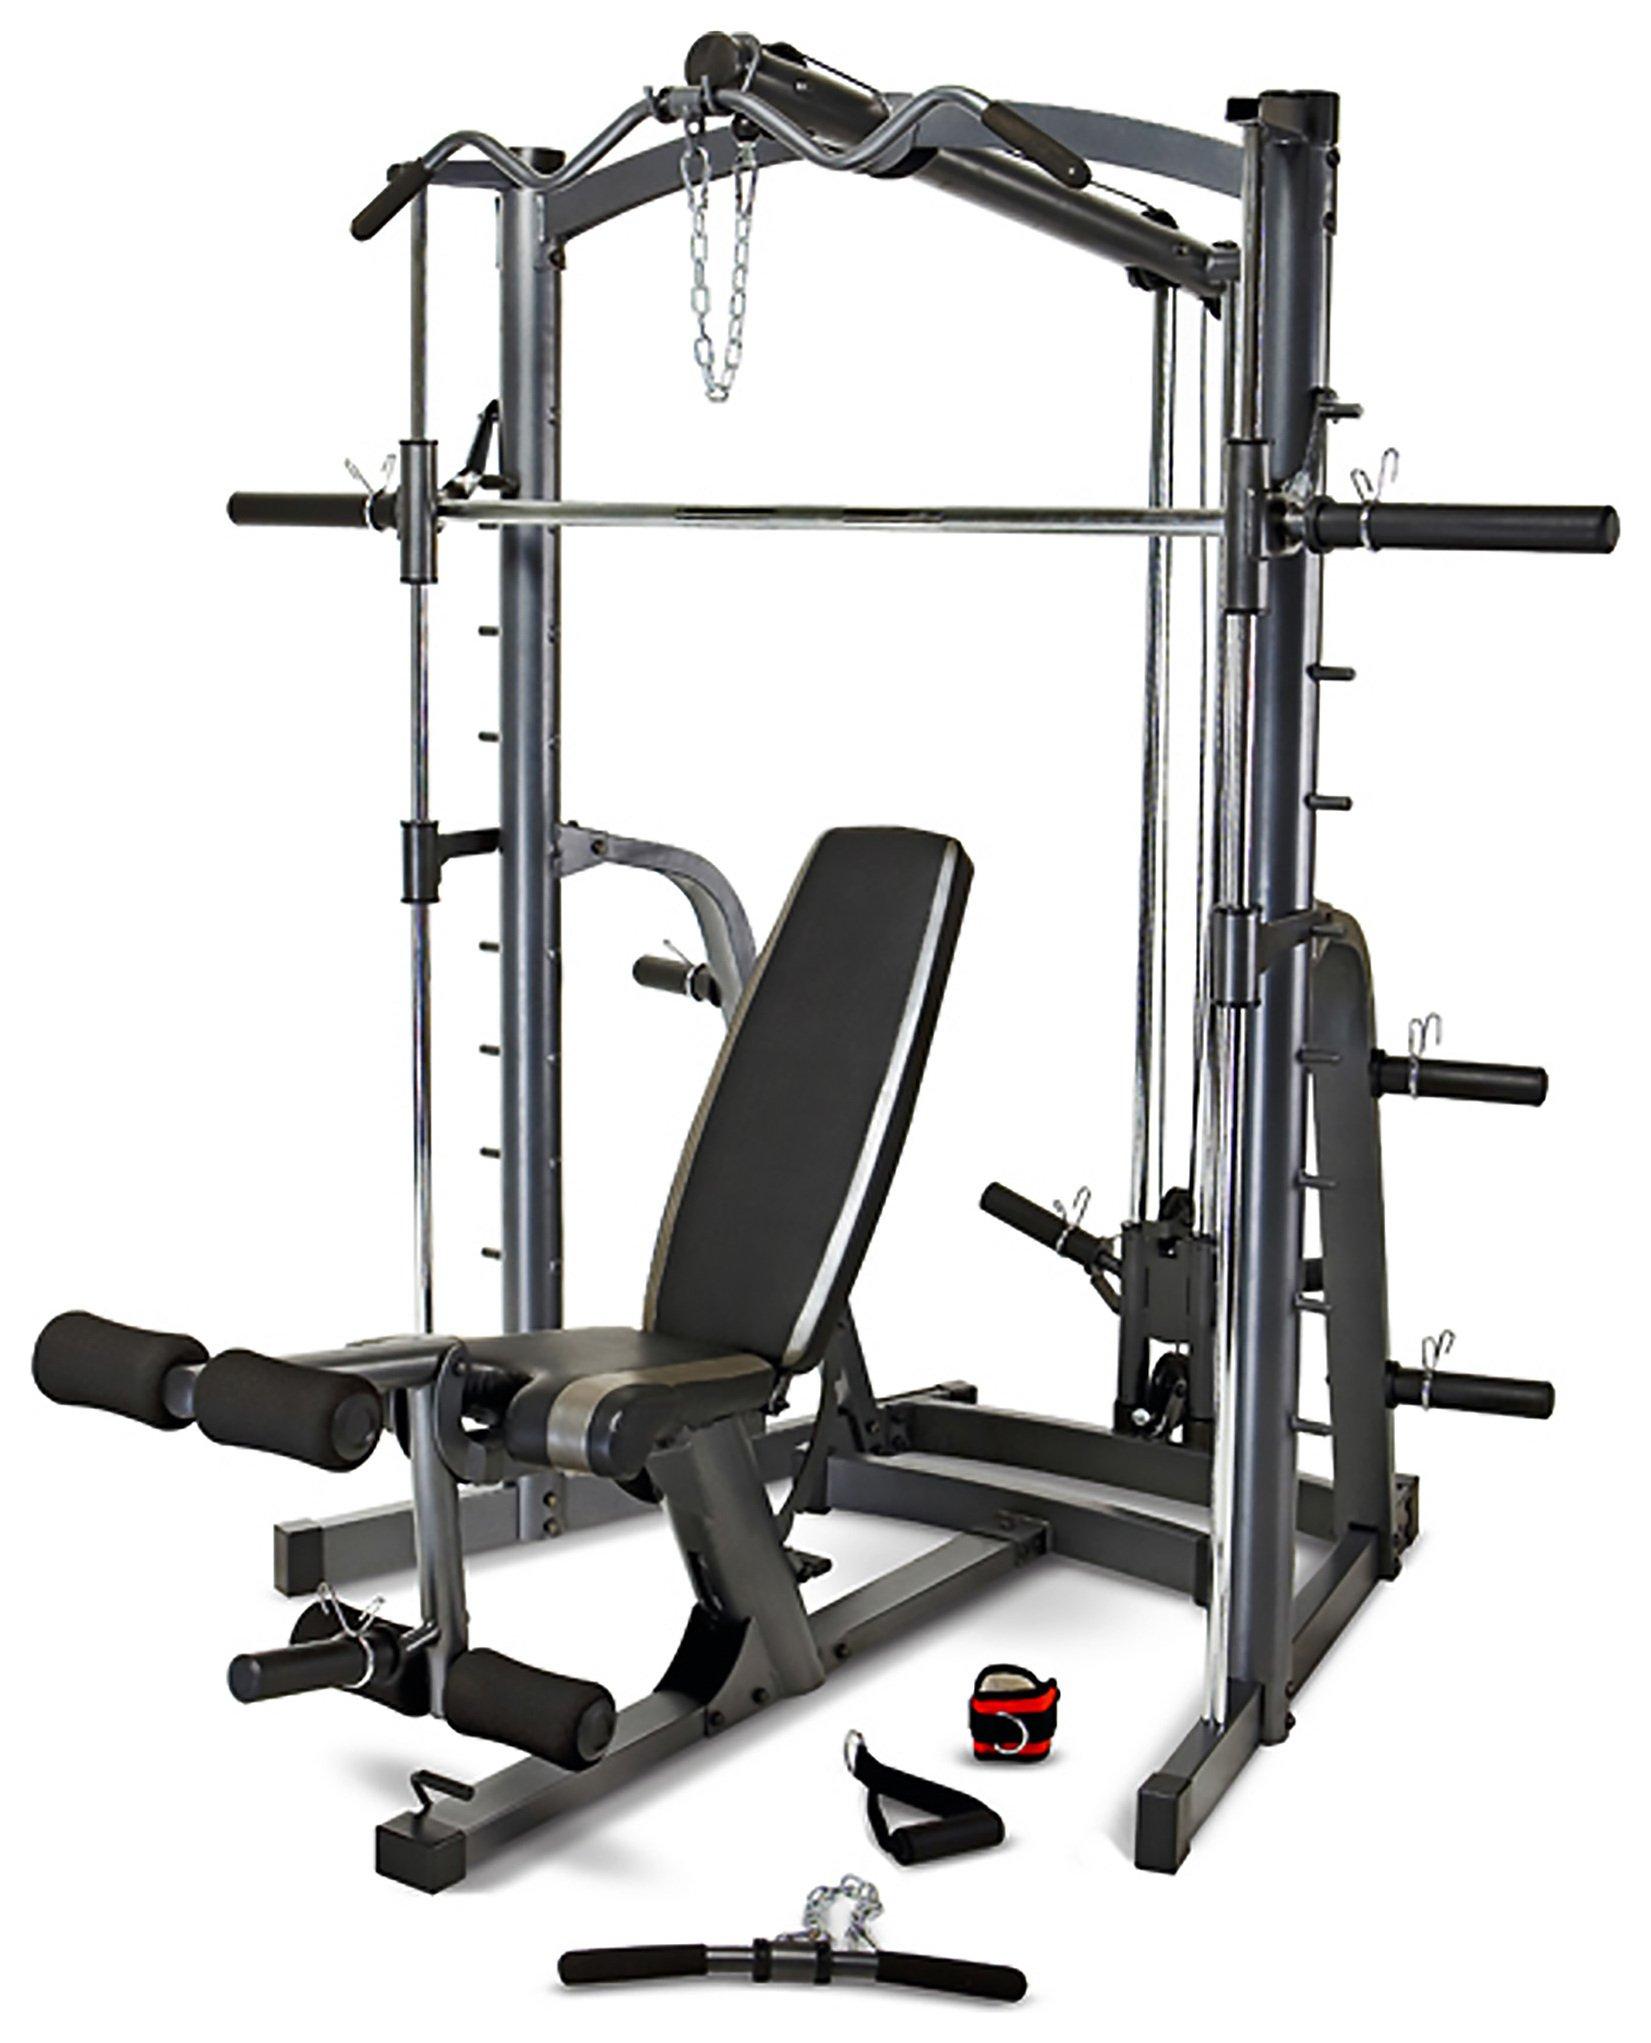 'Marcy Mwb1282 Home Multi Gym Smith Machine.